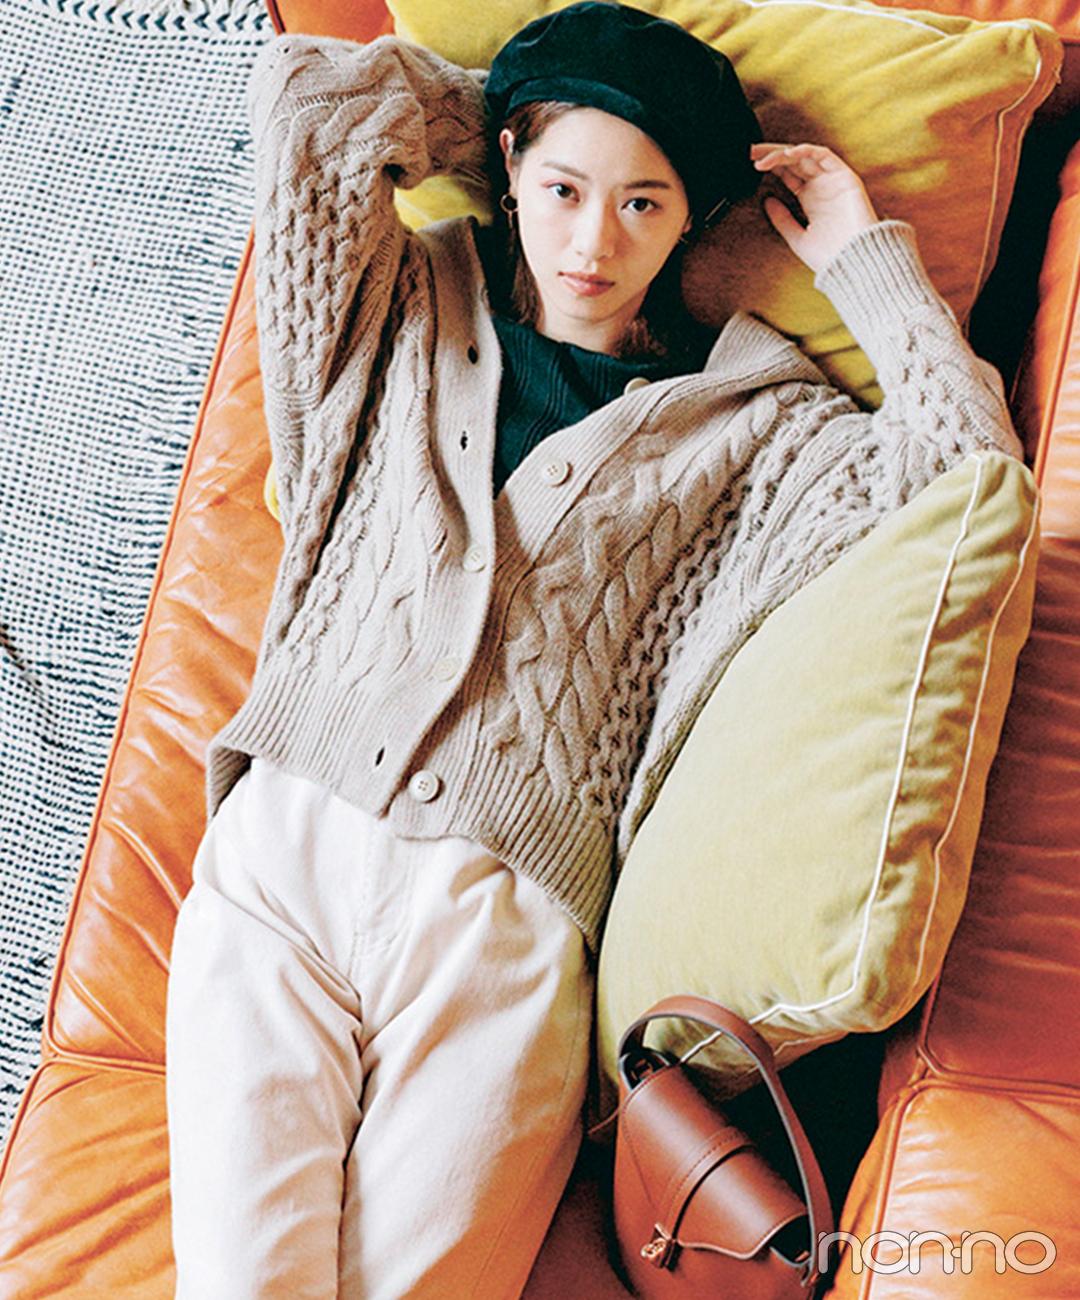 Photo Gallery|モデル・西野七瀬の最新フォトギャラリーを見る_1_20